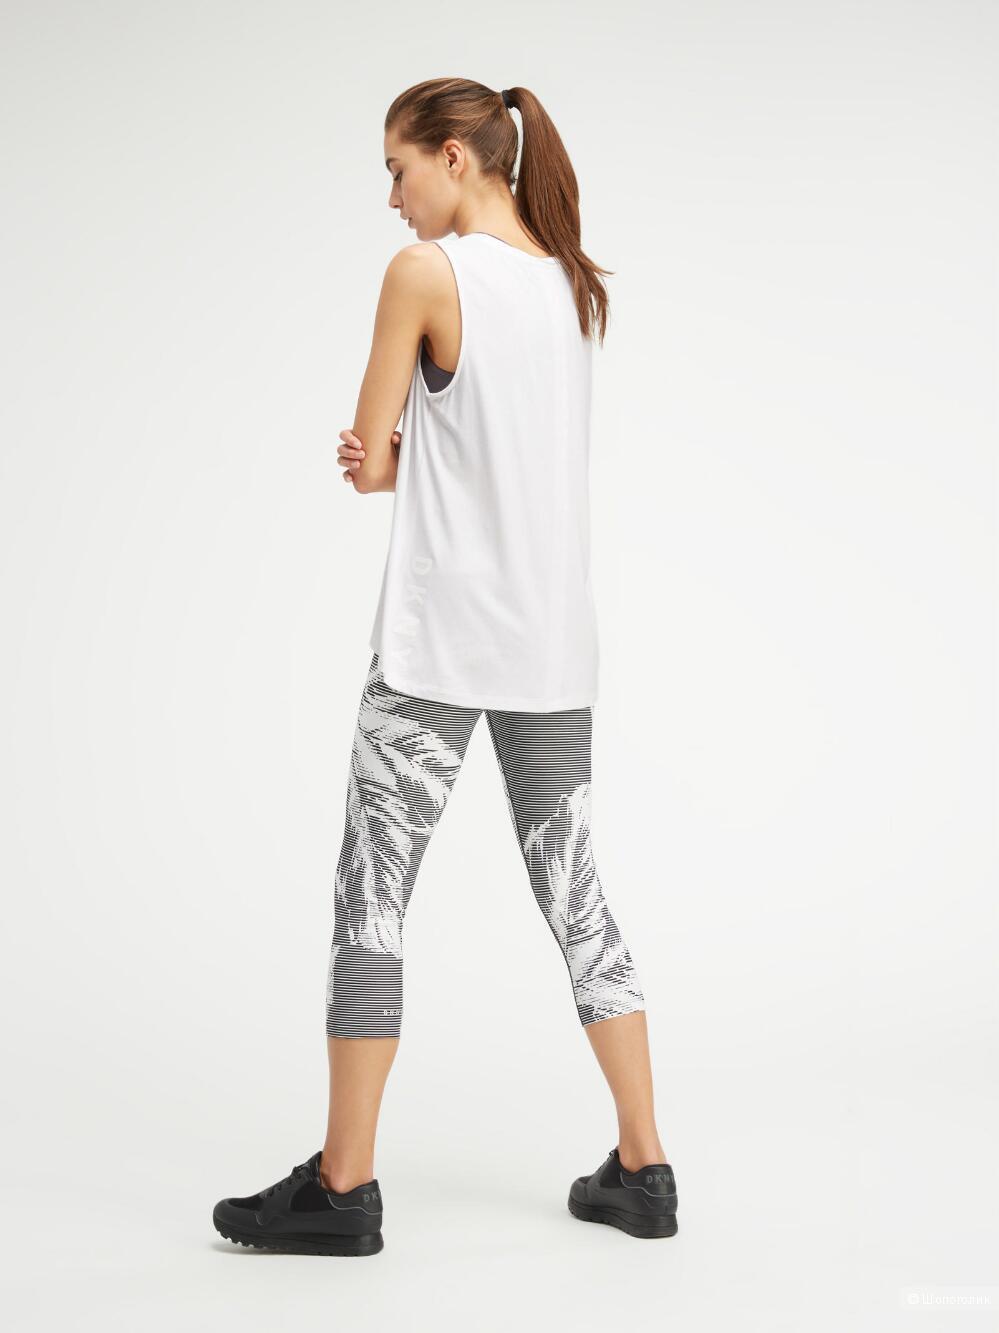 Леггинсы DKNY, размер XS